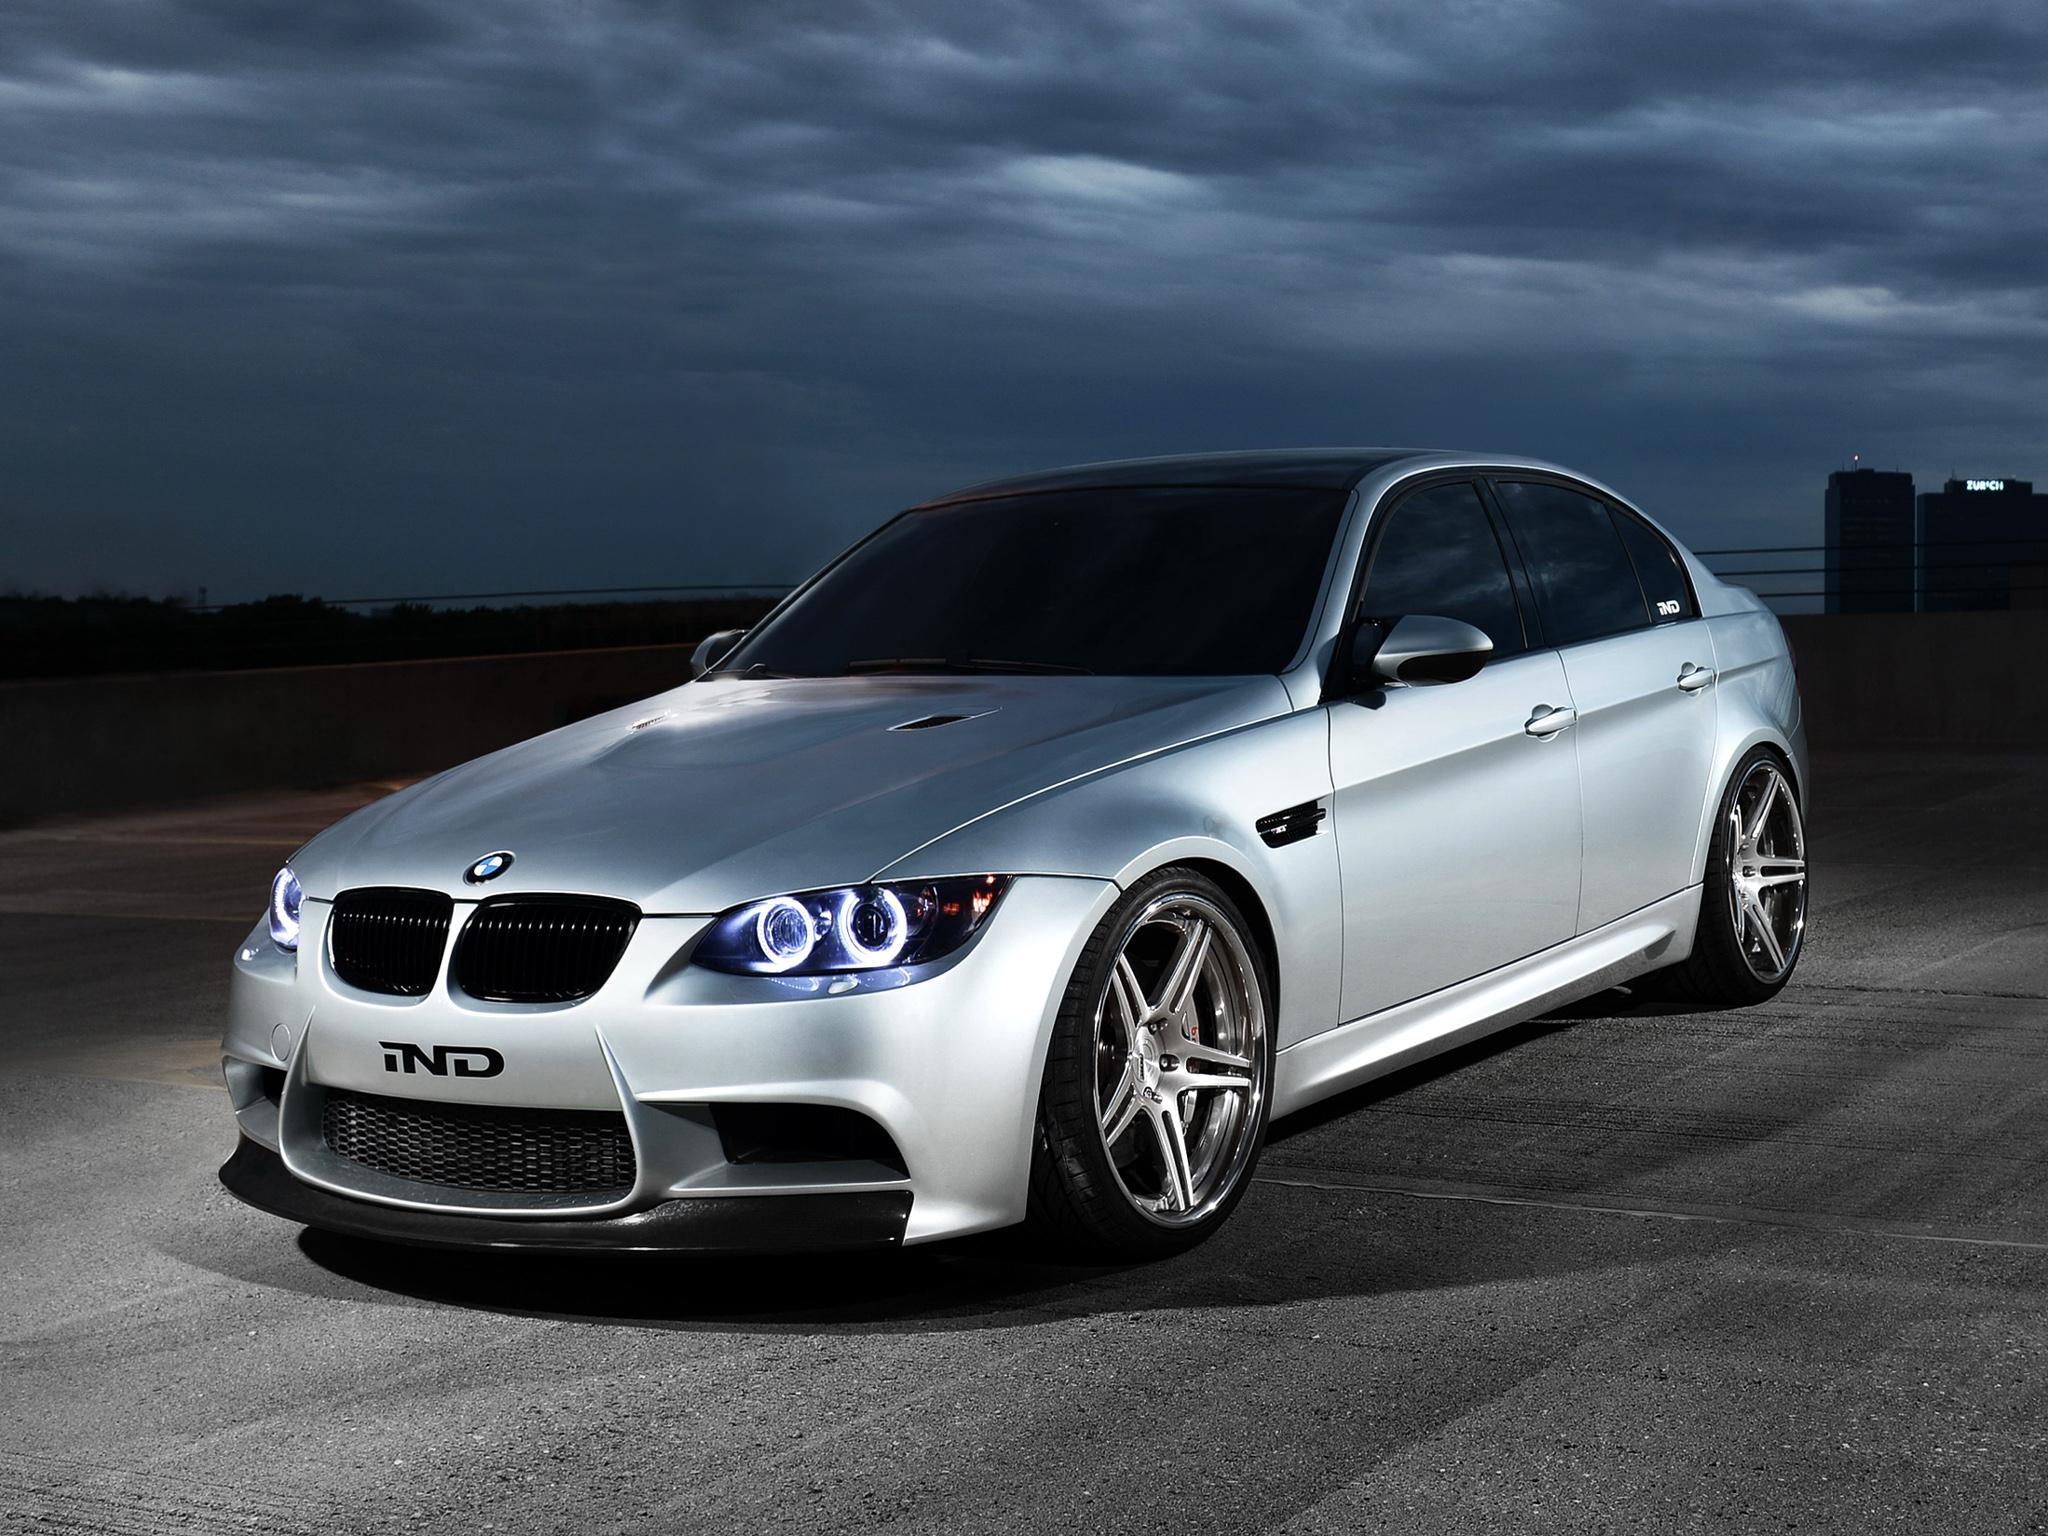 IND BMW M3 Sedan Silver Ghost E90 2012 wallpaper 512 2048x1536